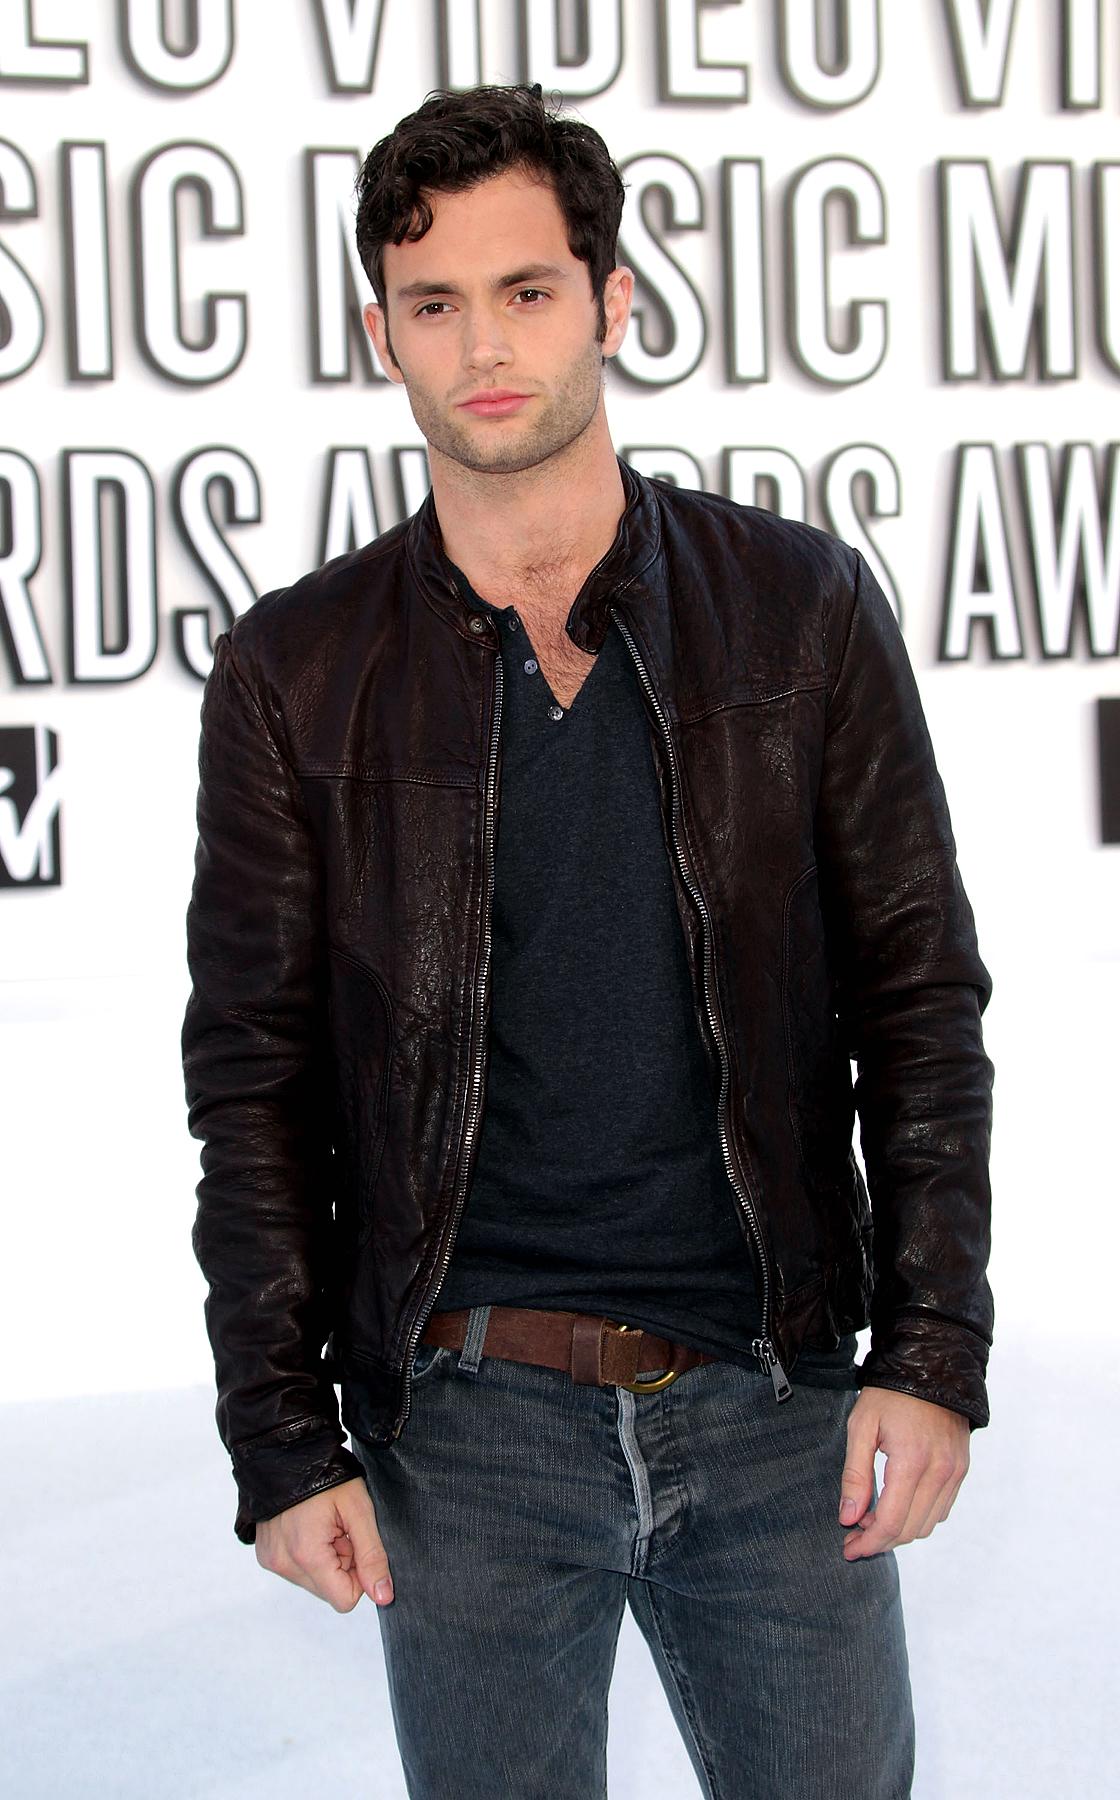 Penn Badgley at the 2010 MTV Video Music Awards (PHOTOS)